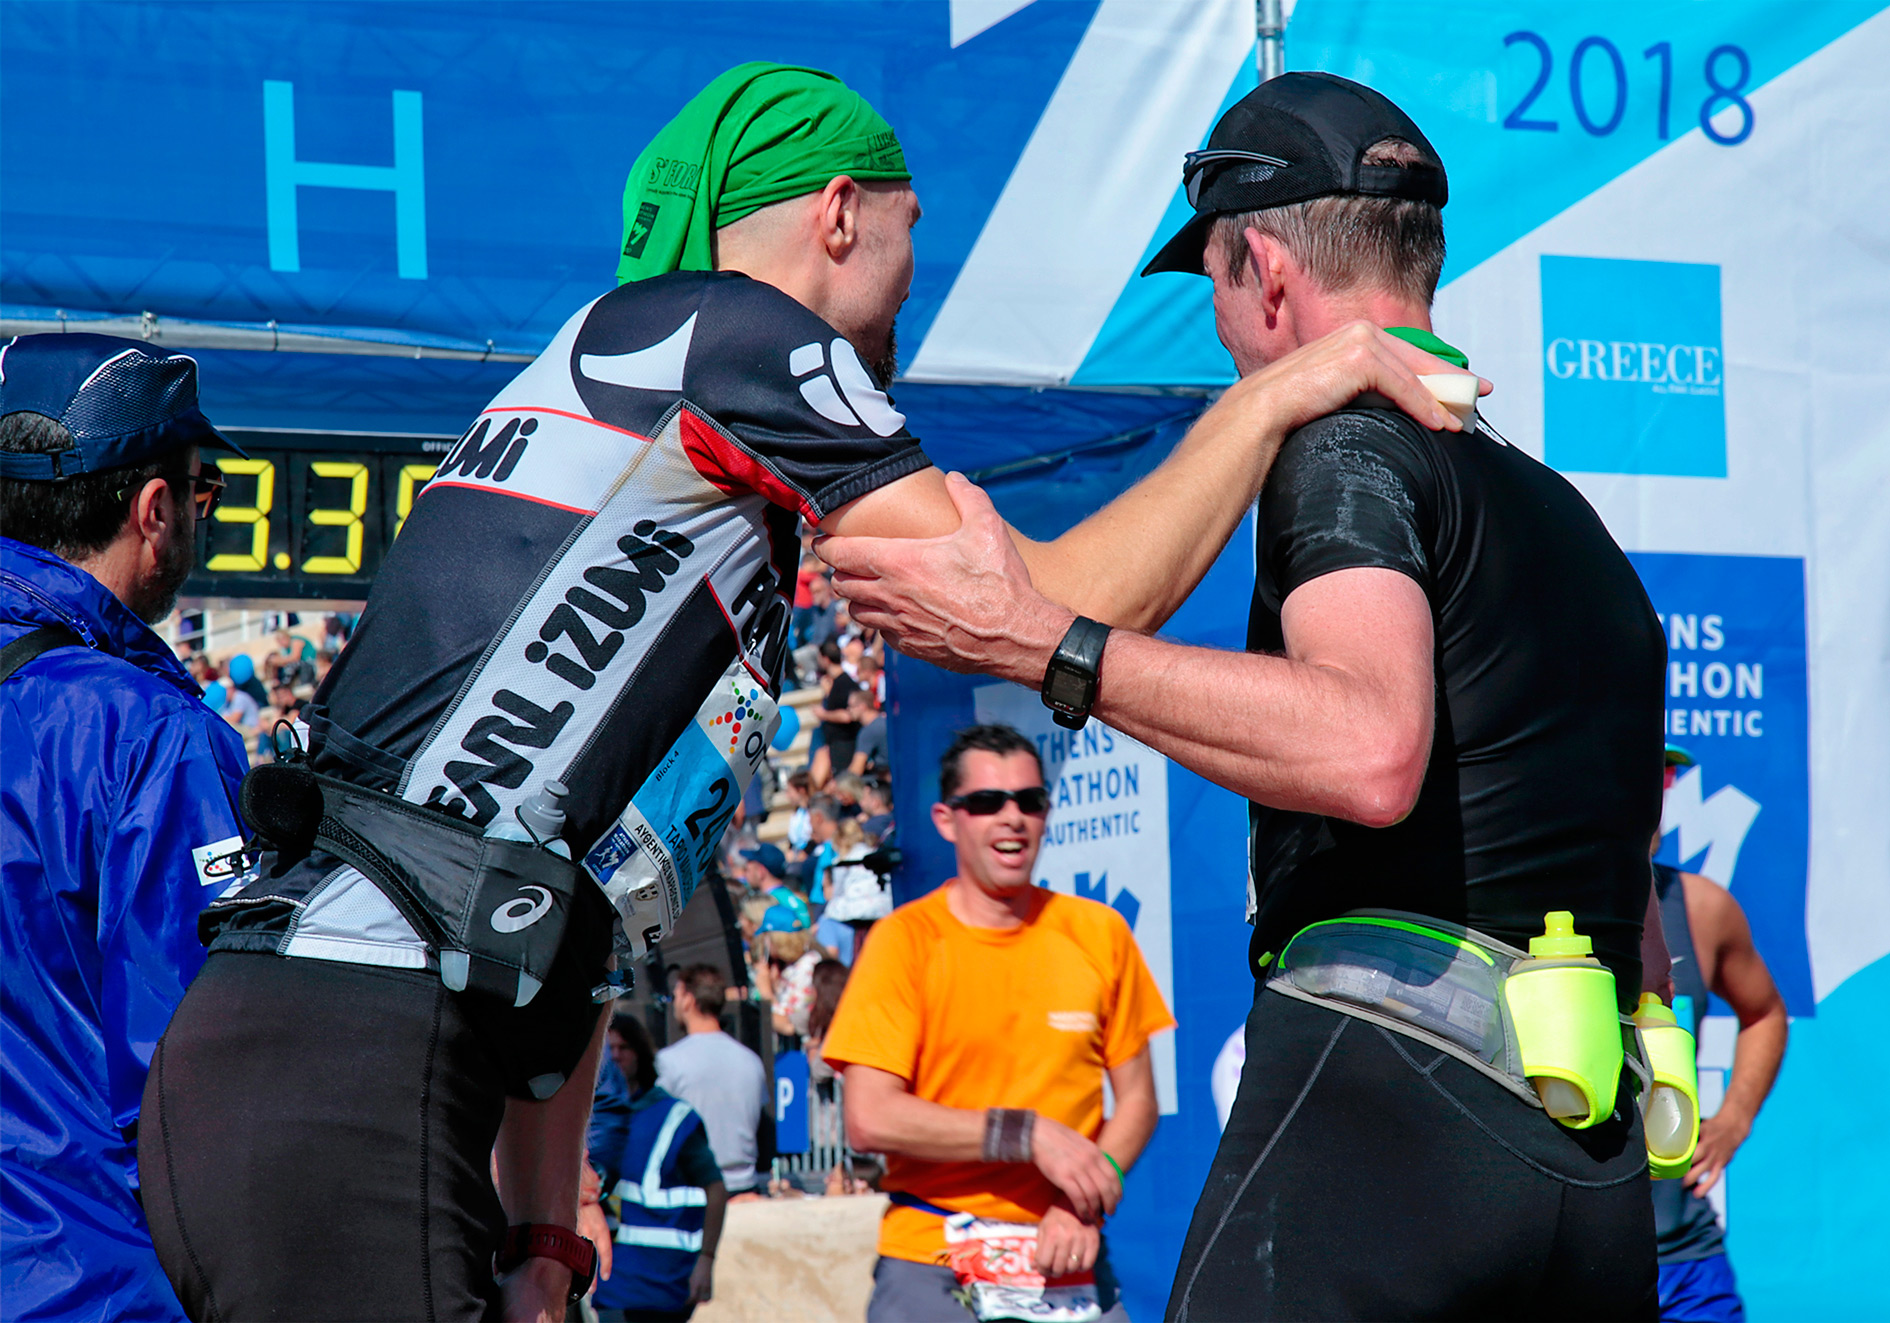 Athens marathon race 2019